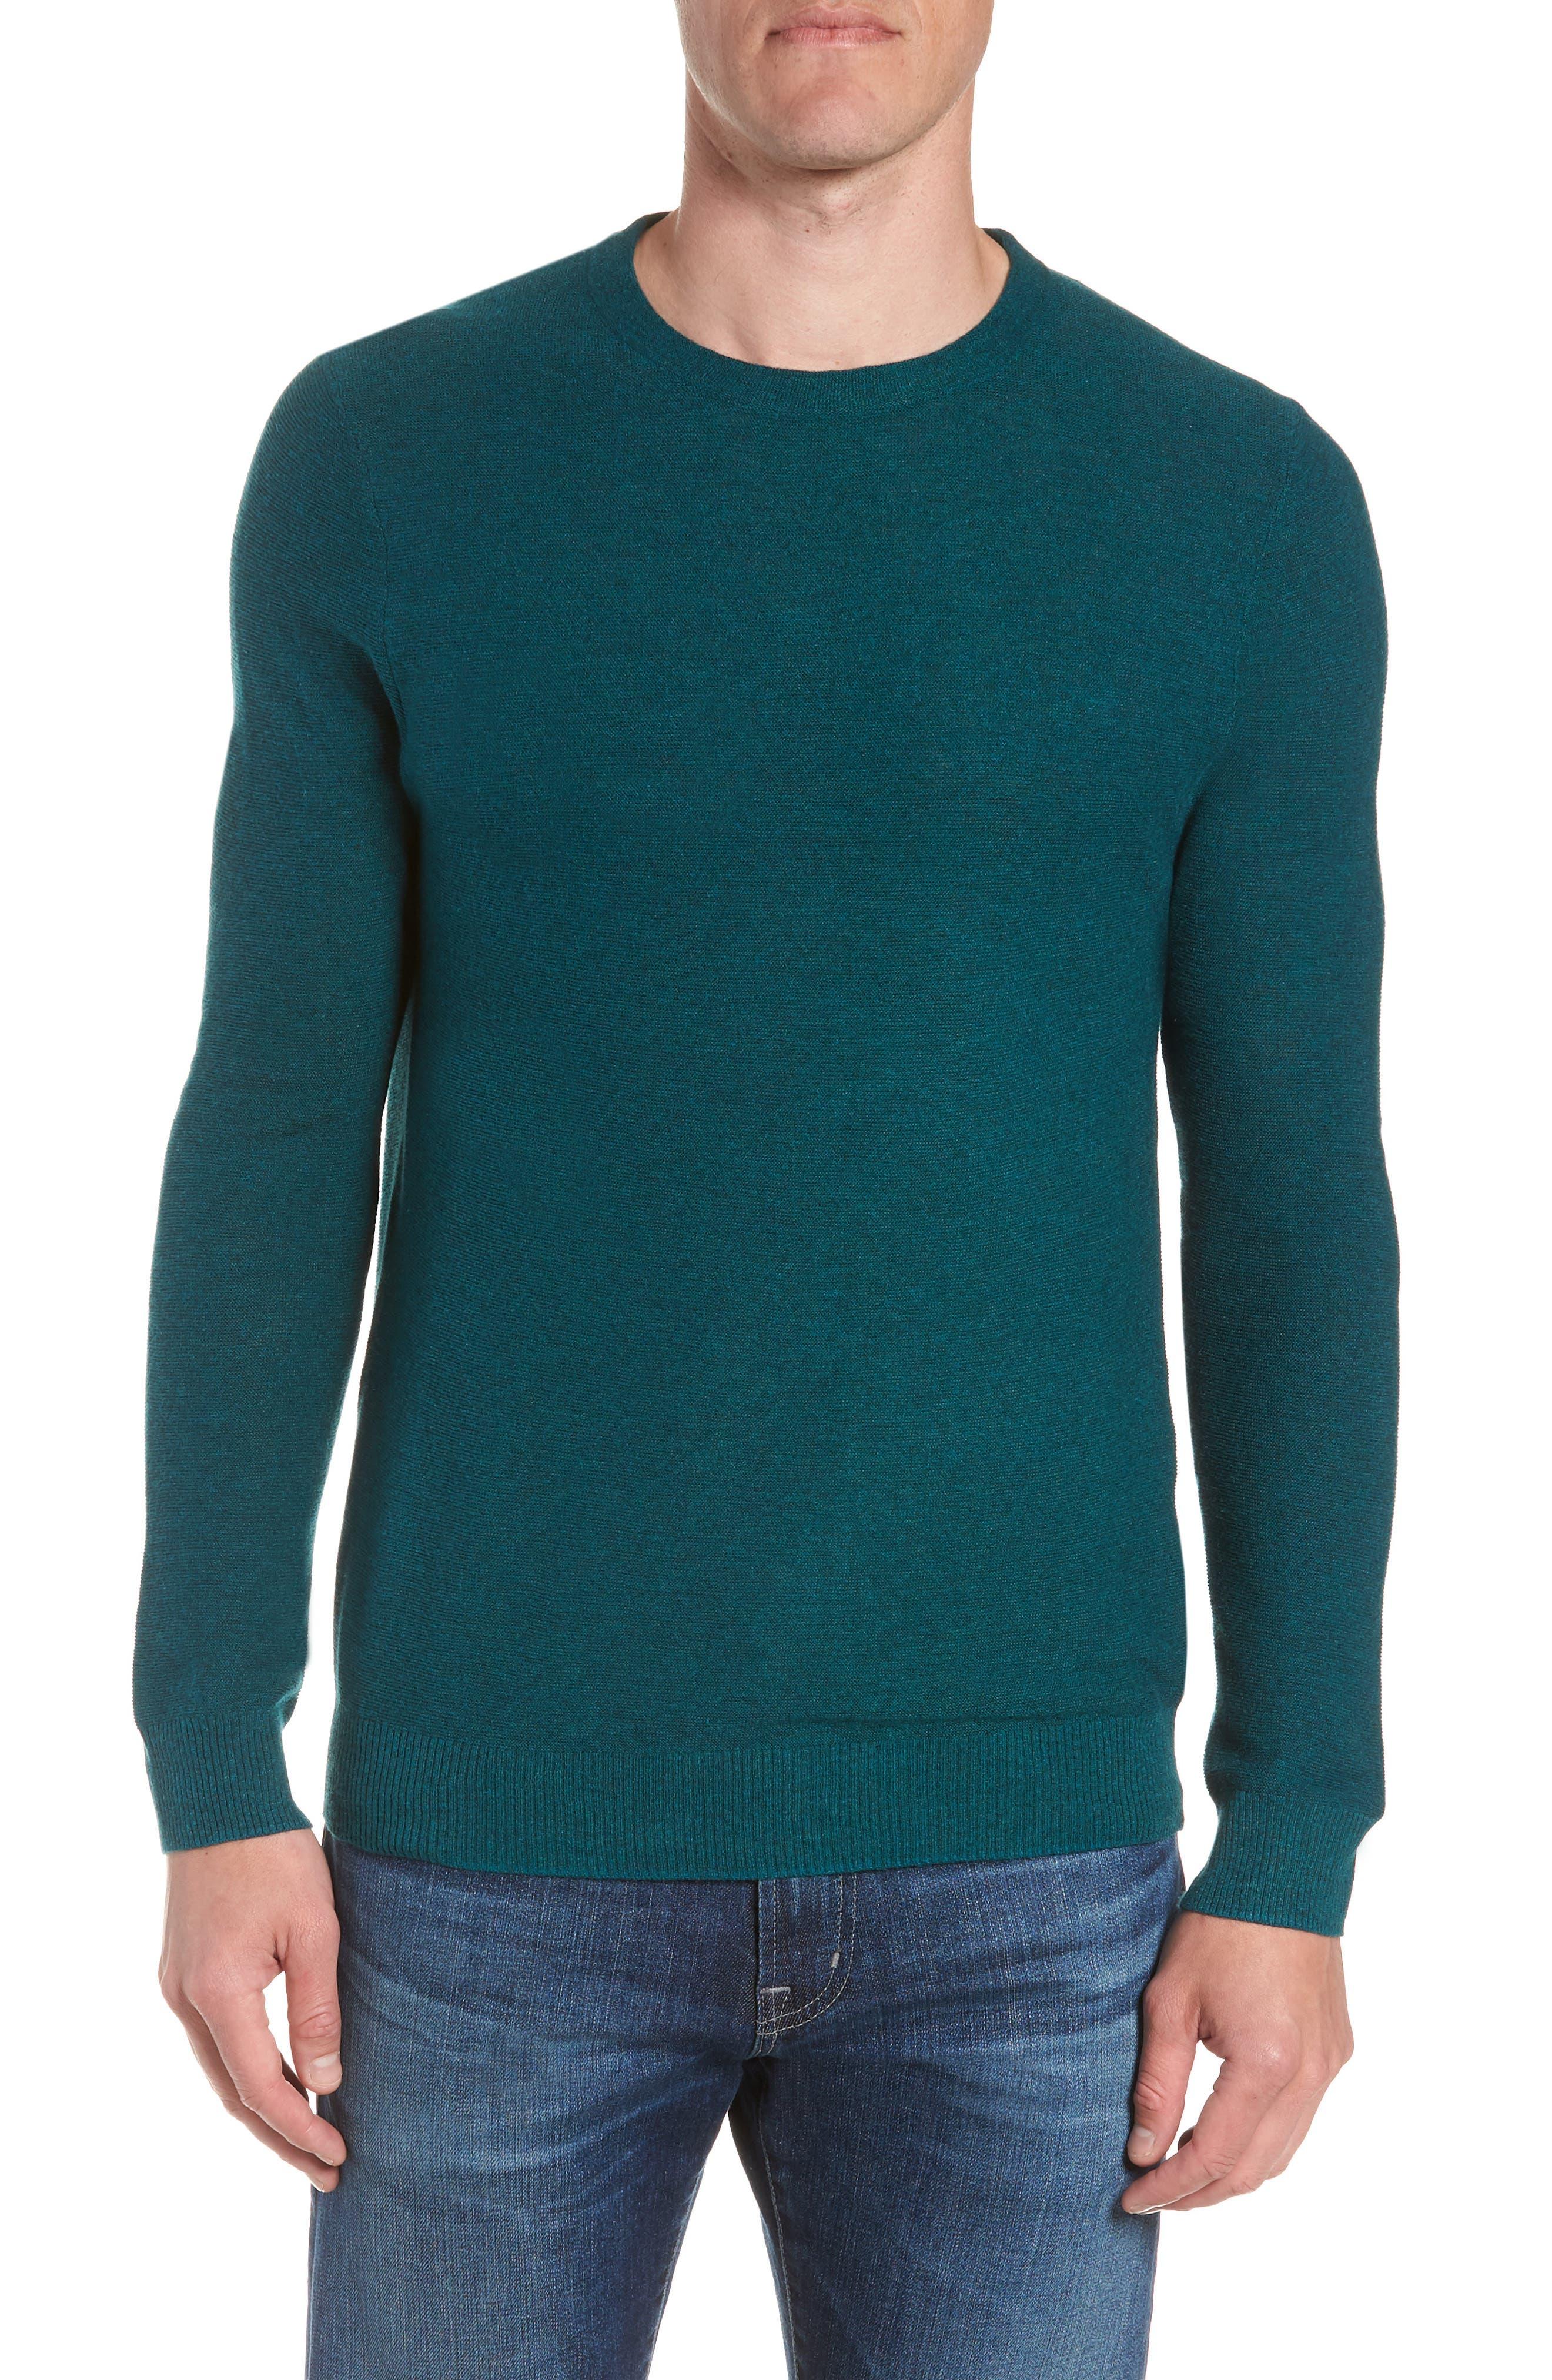 Slim Fit Crewneck Sweater,                         Main,                         color, Heather Peacock